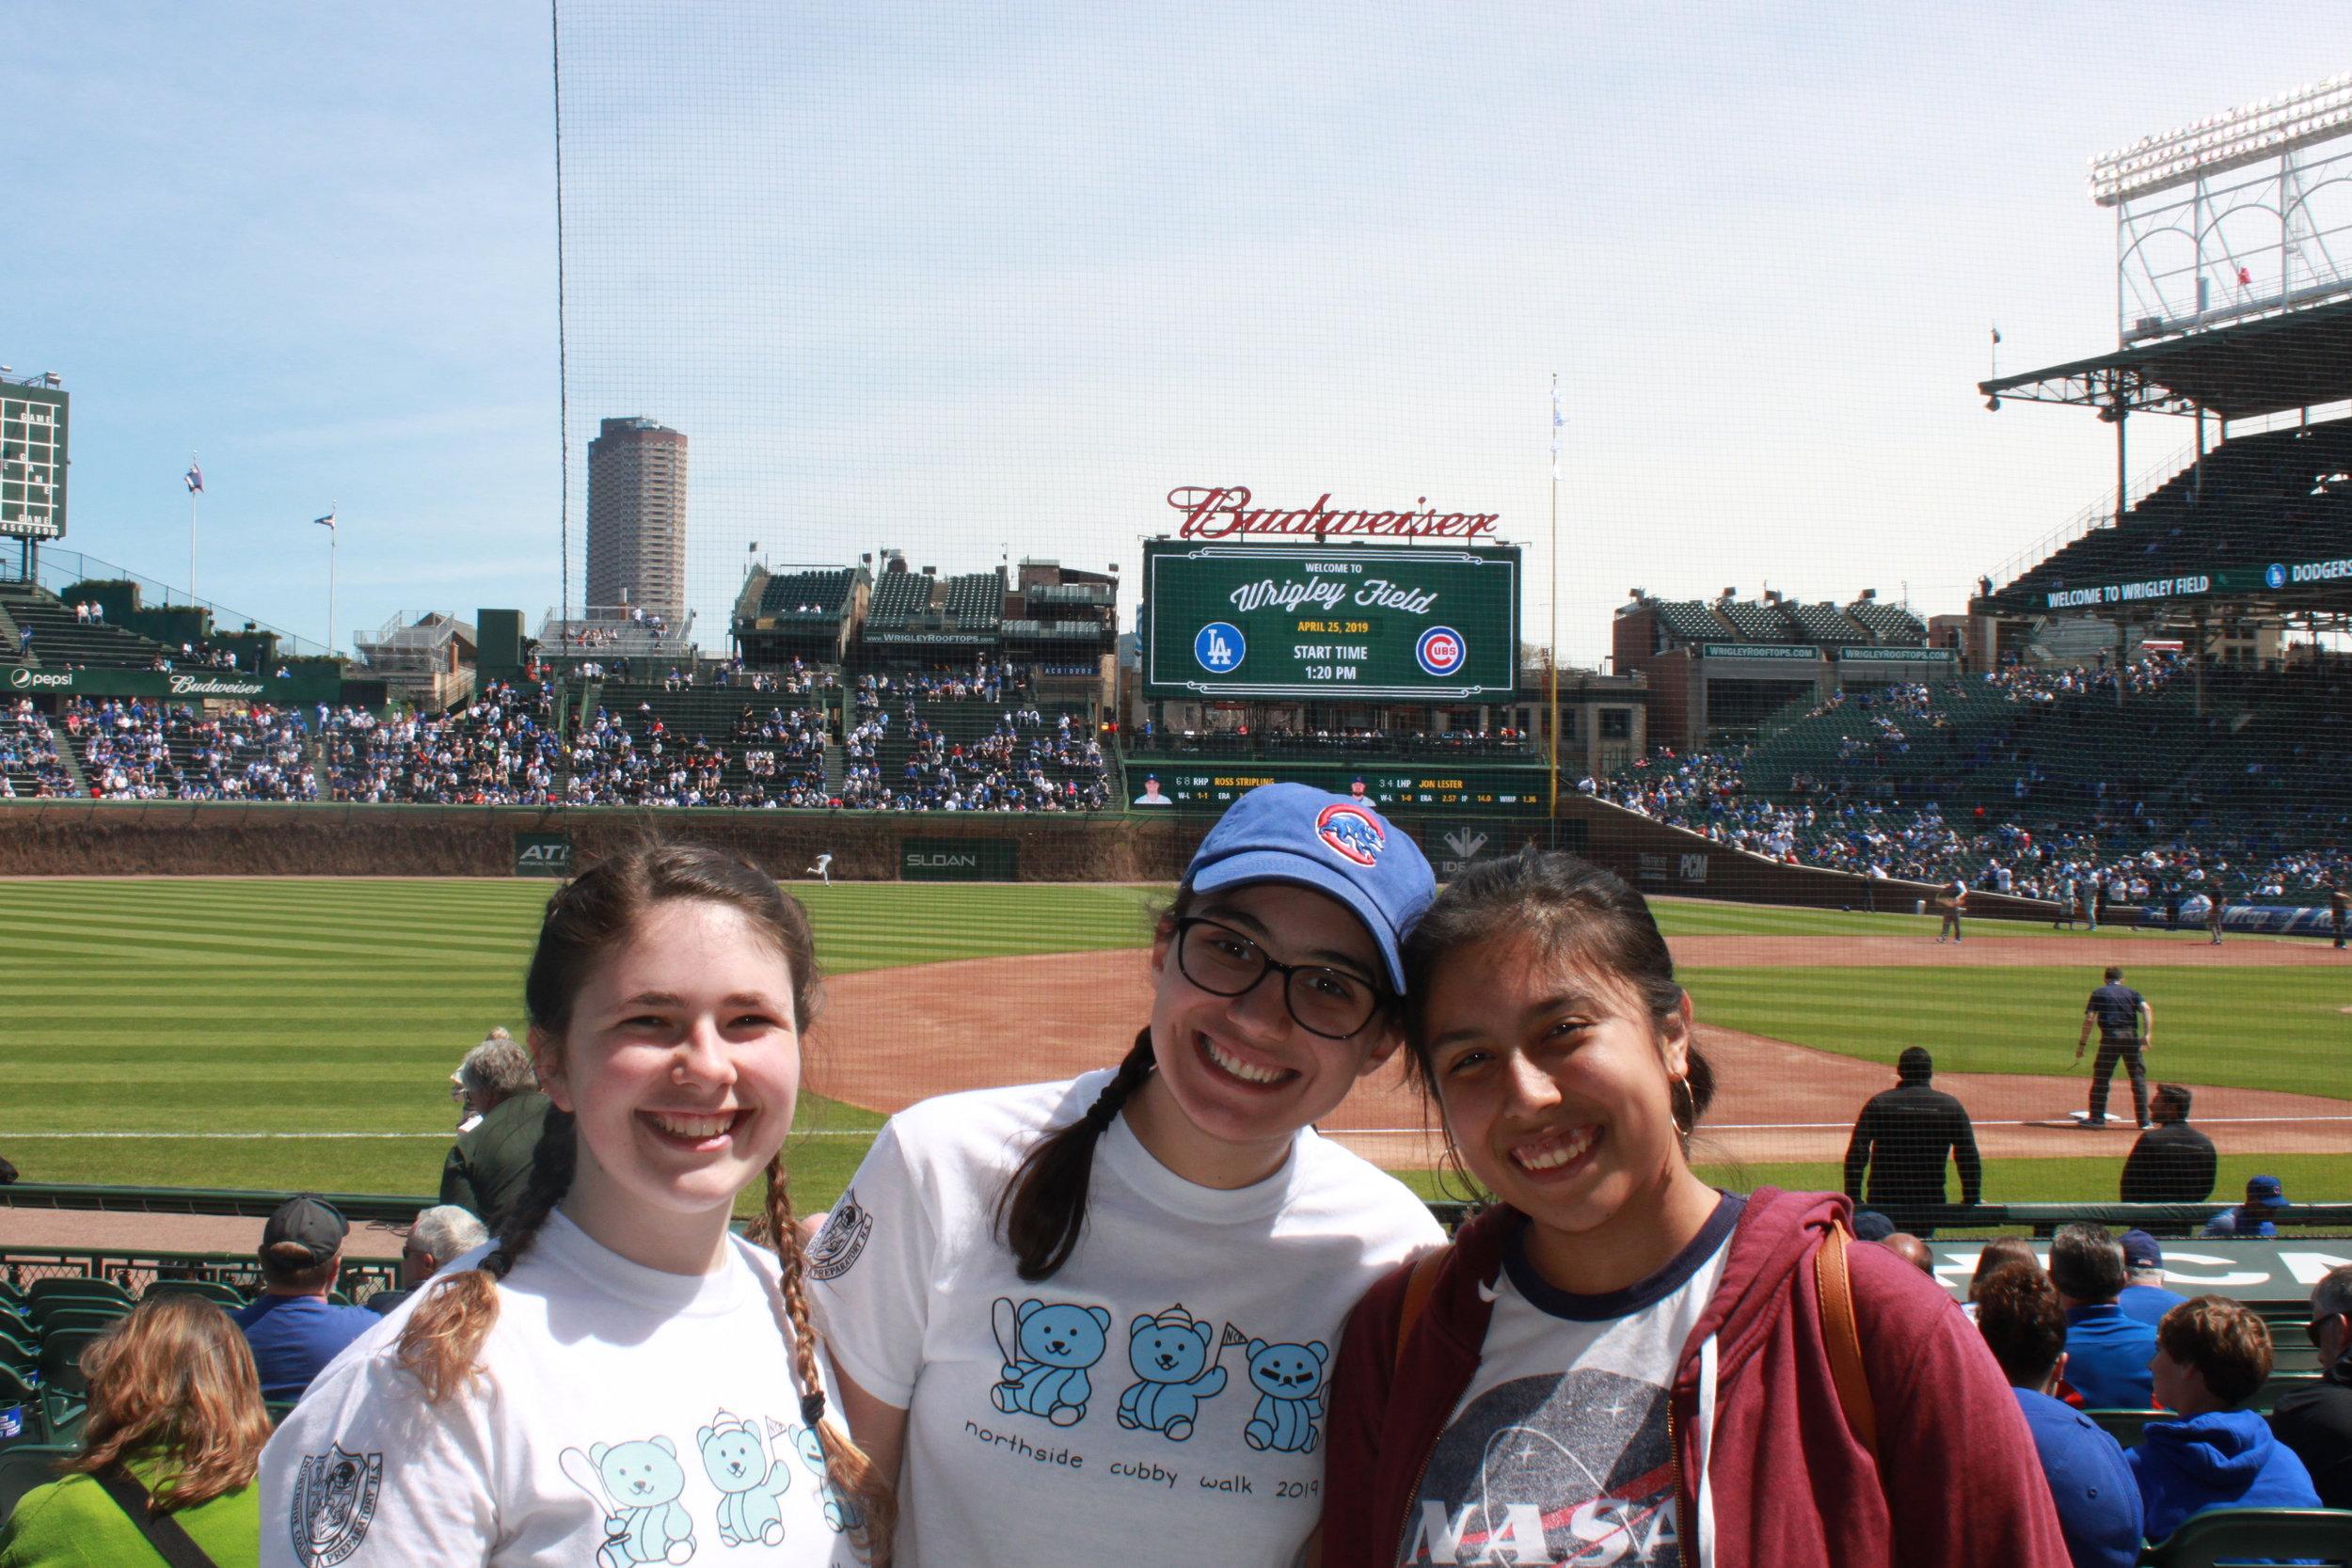 Savannah Graziano, Adv. 903, Audrey Ruhana, Adv. 903, and Brianna Gonzalez, Adv. 900, pose in front of the scoreboard.